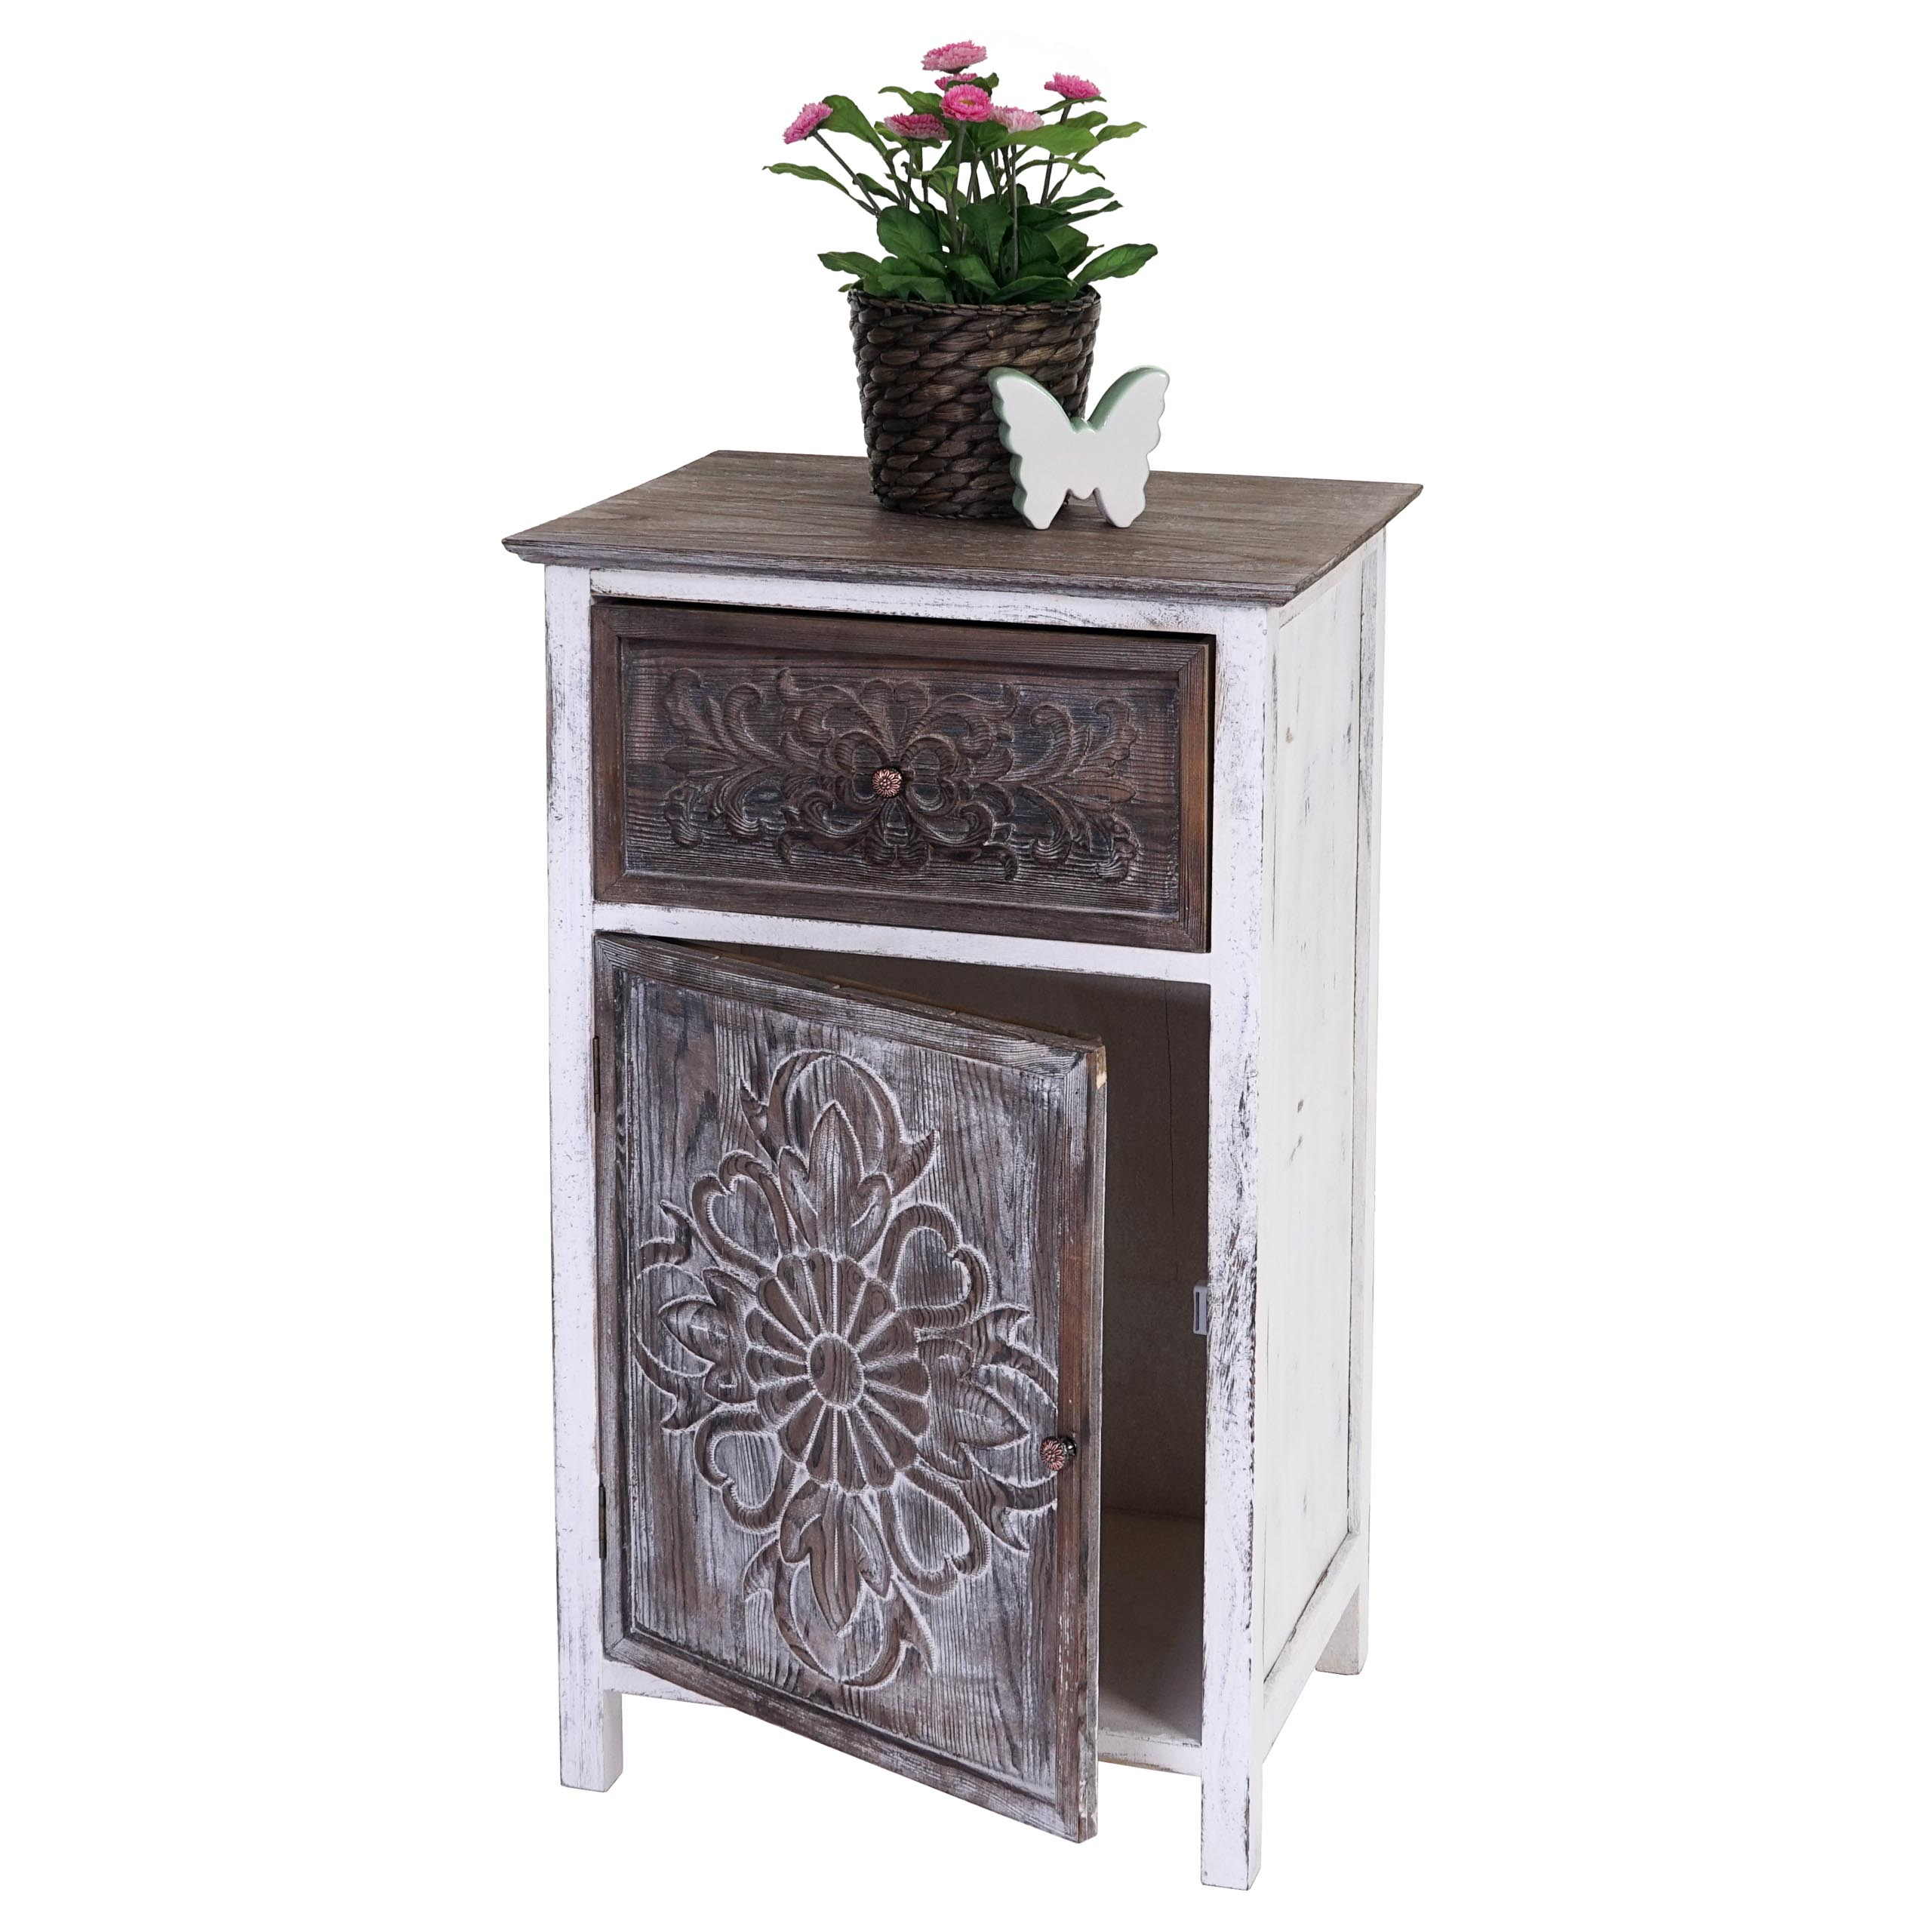 kommode galway schubladenkommode schrank shabby look vintage 75x45x34cm. Black Bedroom Furniture Sets. Home Design Ideas